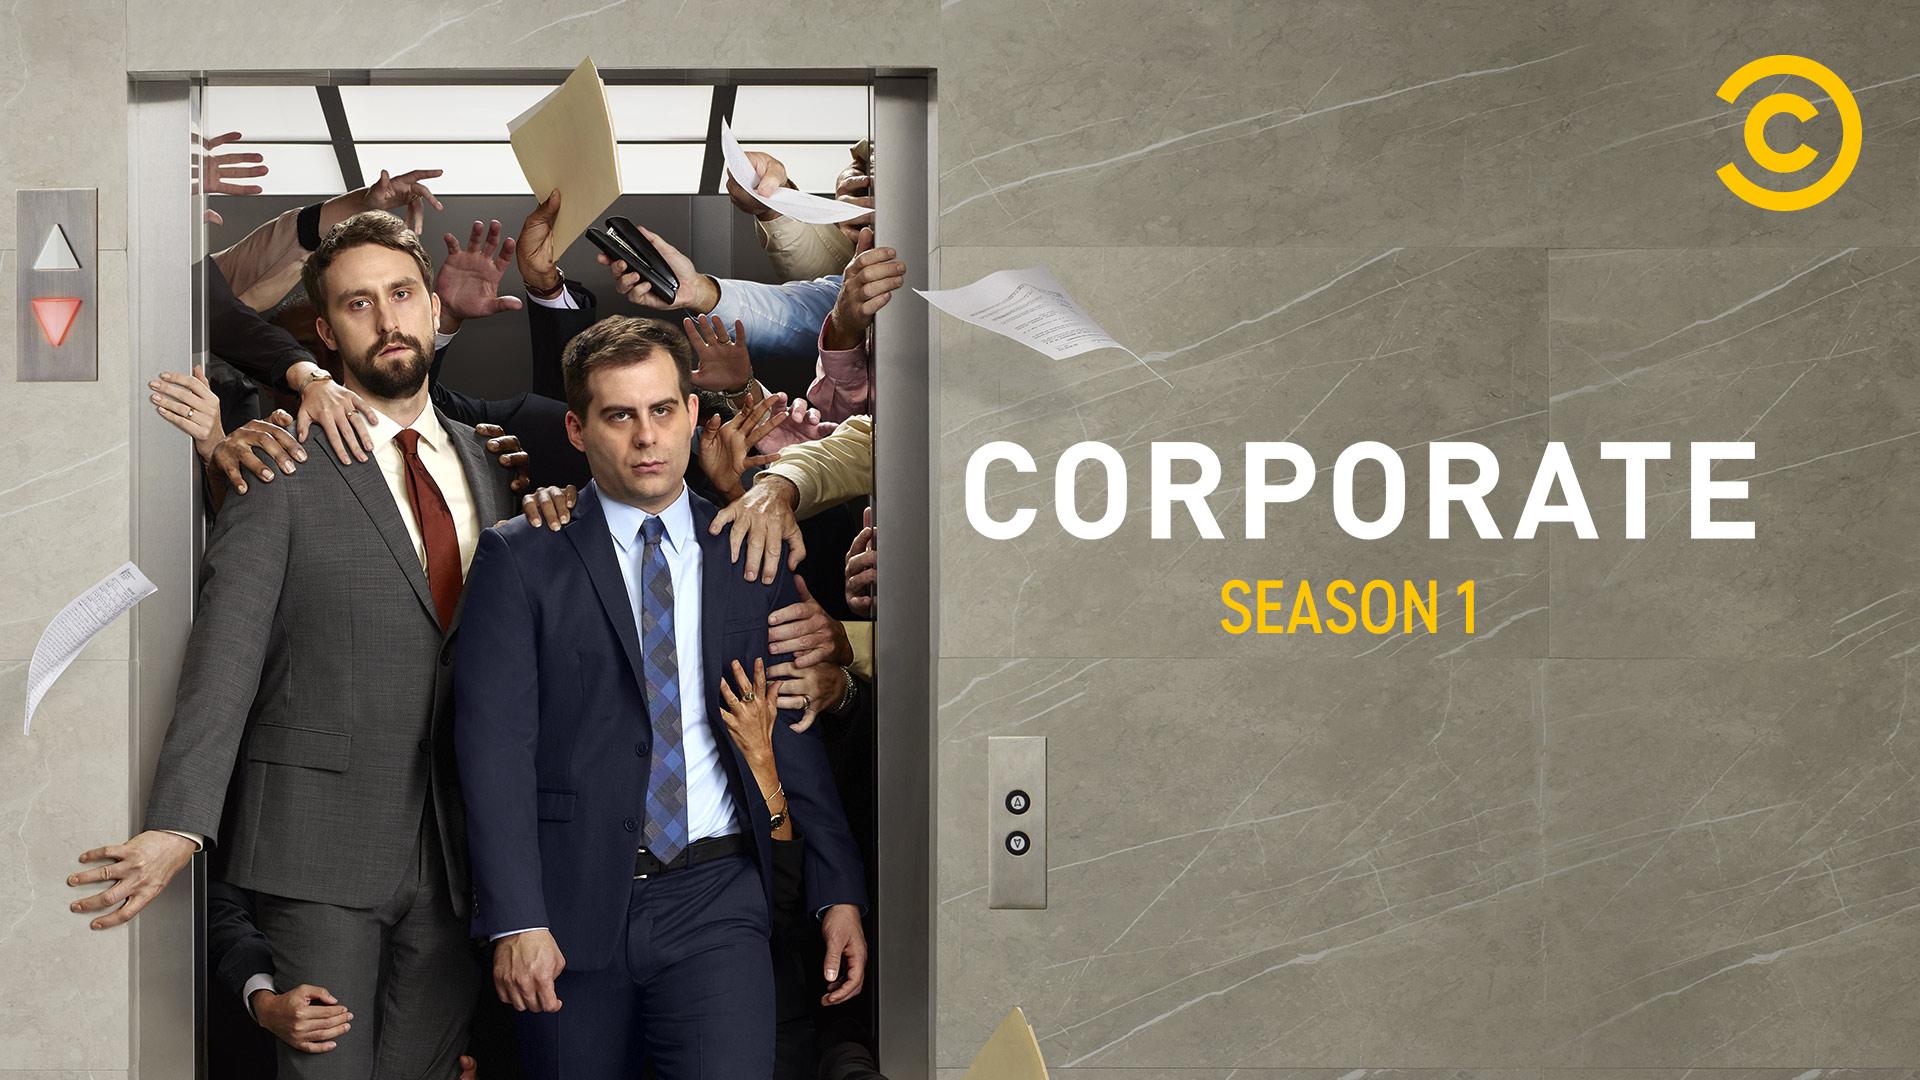 Corporate Season 1